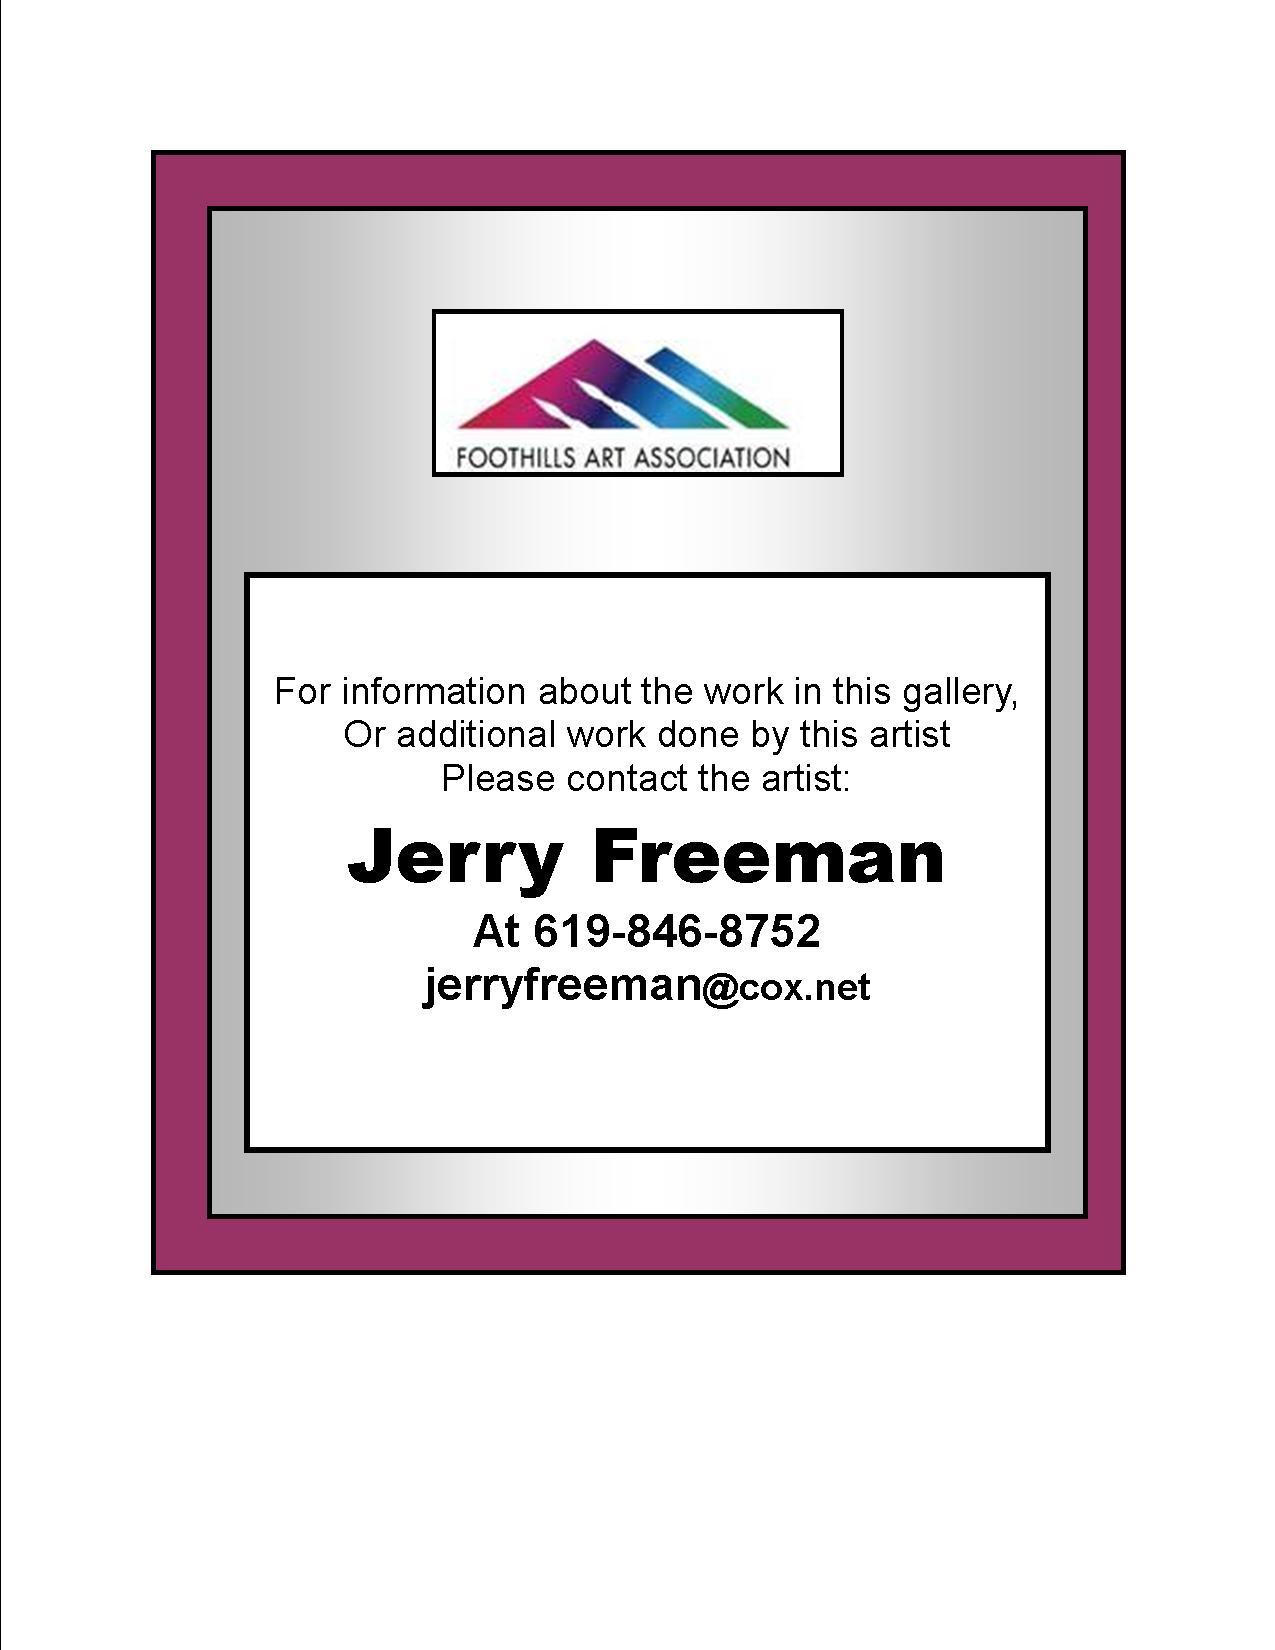 Jerry Freeman - Contact